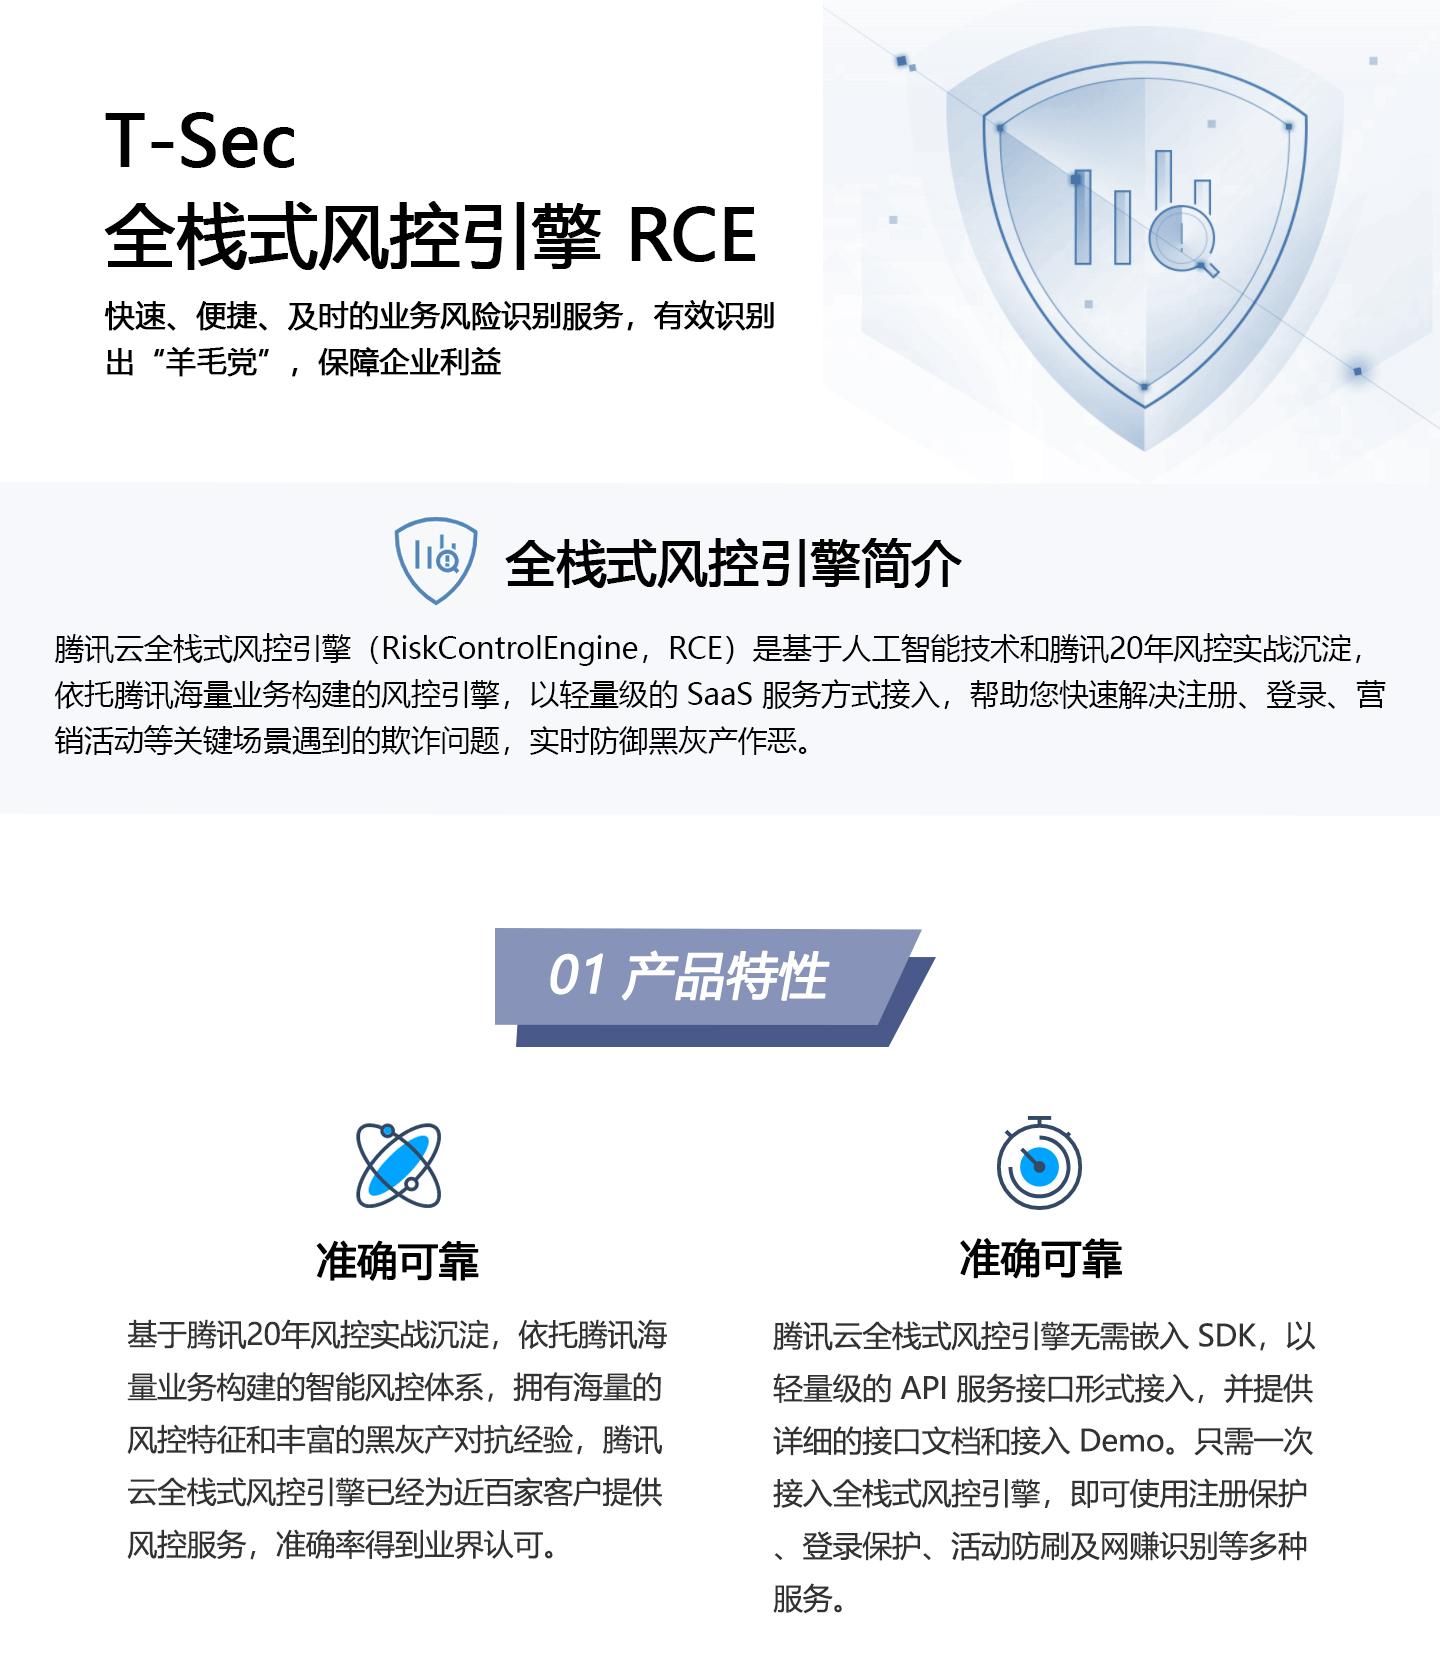 T-Sec-全栈式风控引擎-RCE1440_01.jpg